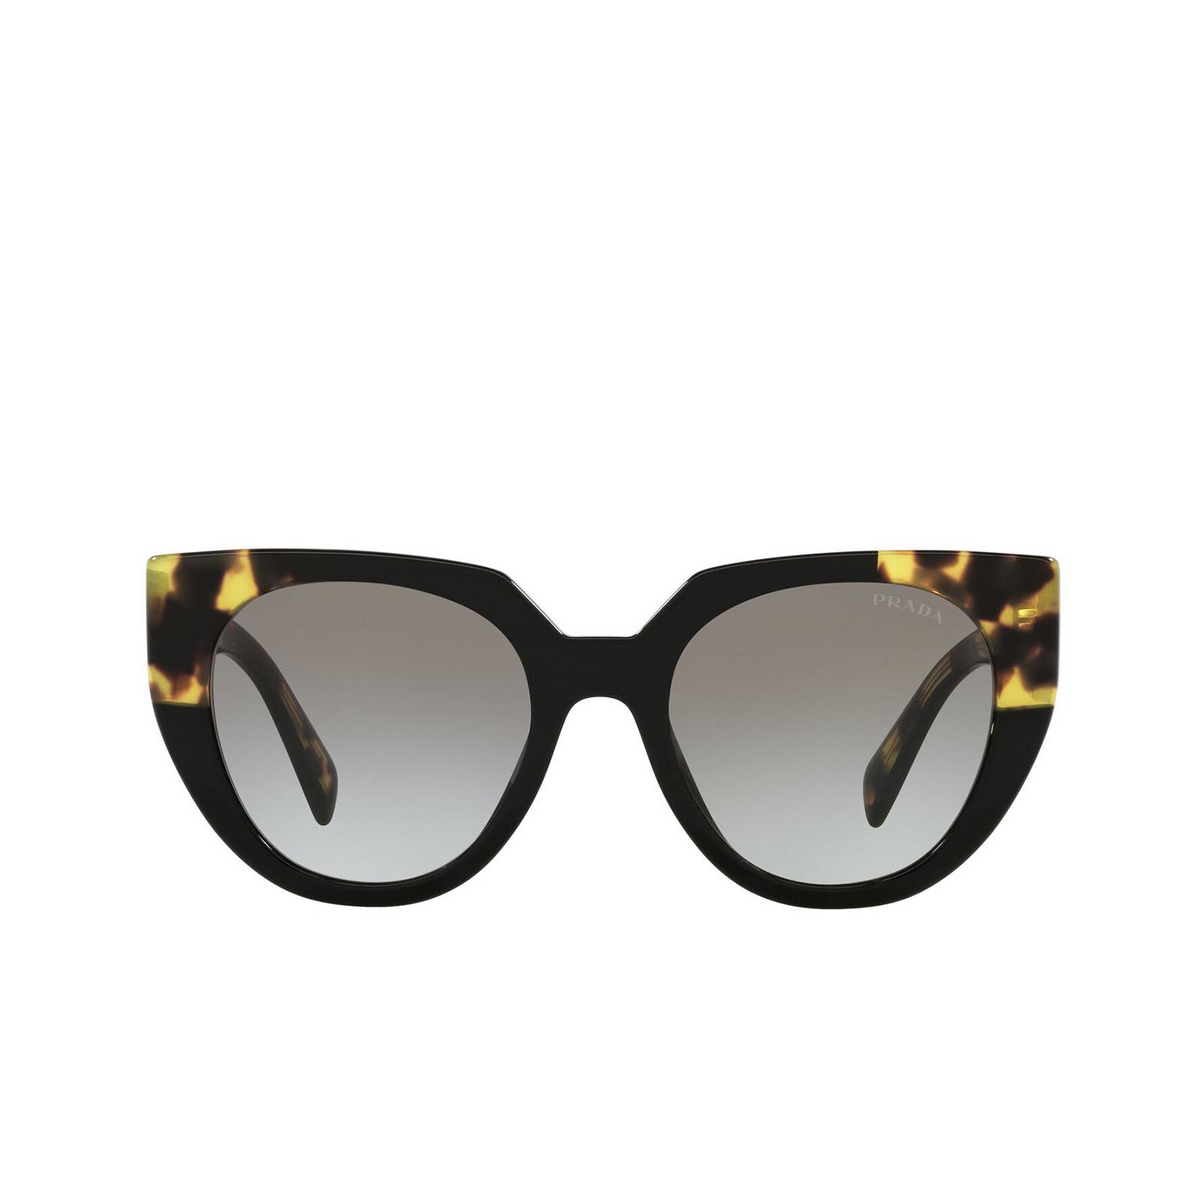 Prada® Cat-eye Sunglasses: PR 14WS color Black / Medium Tortoise 3890A7.